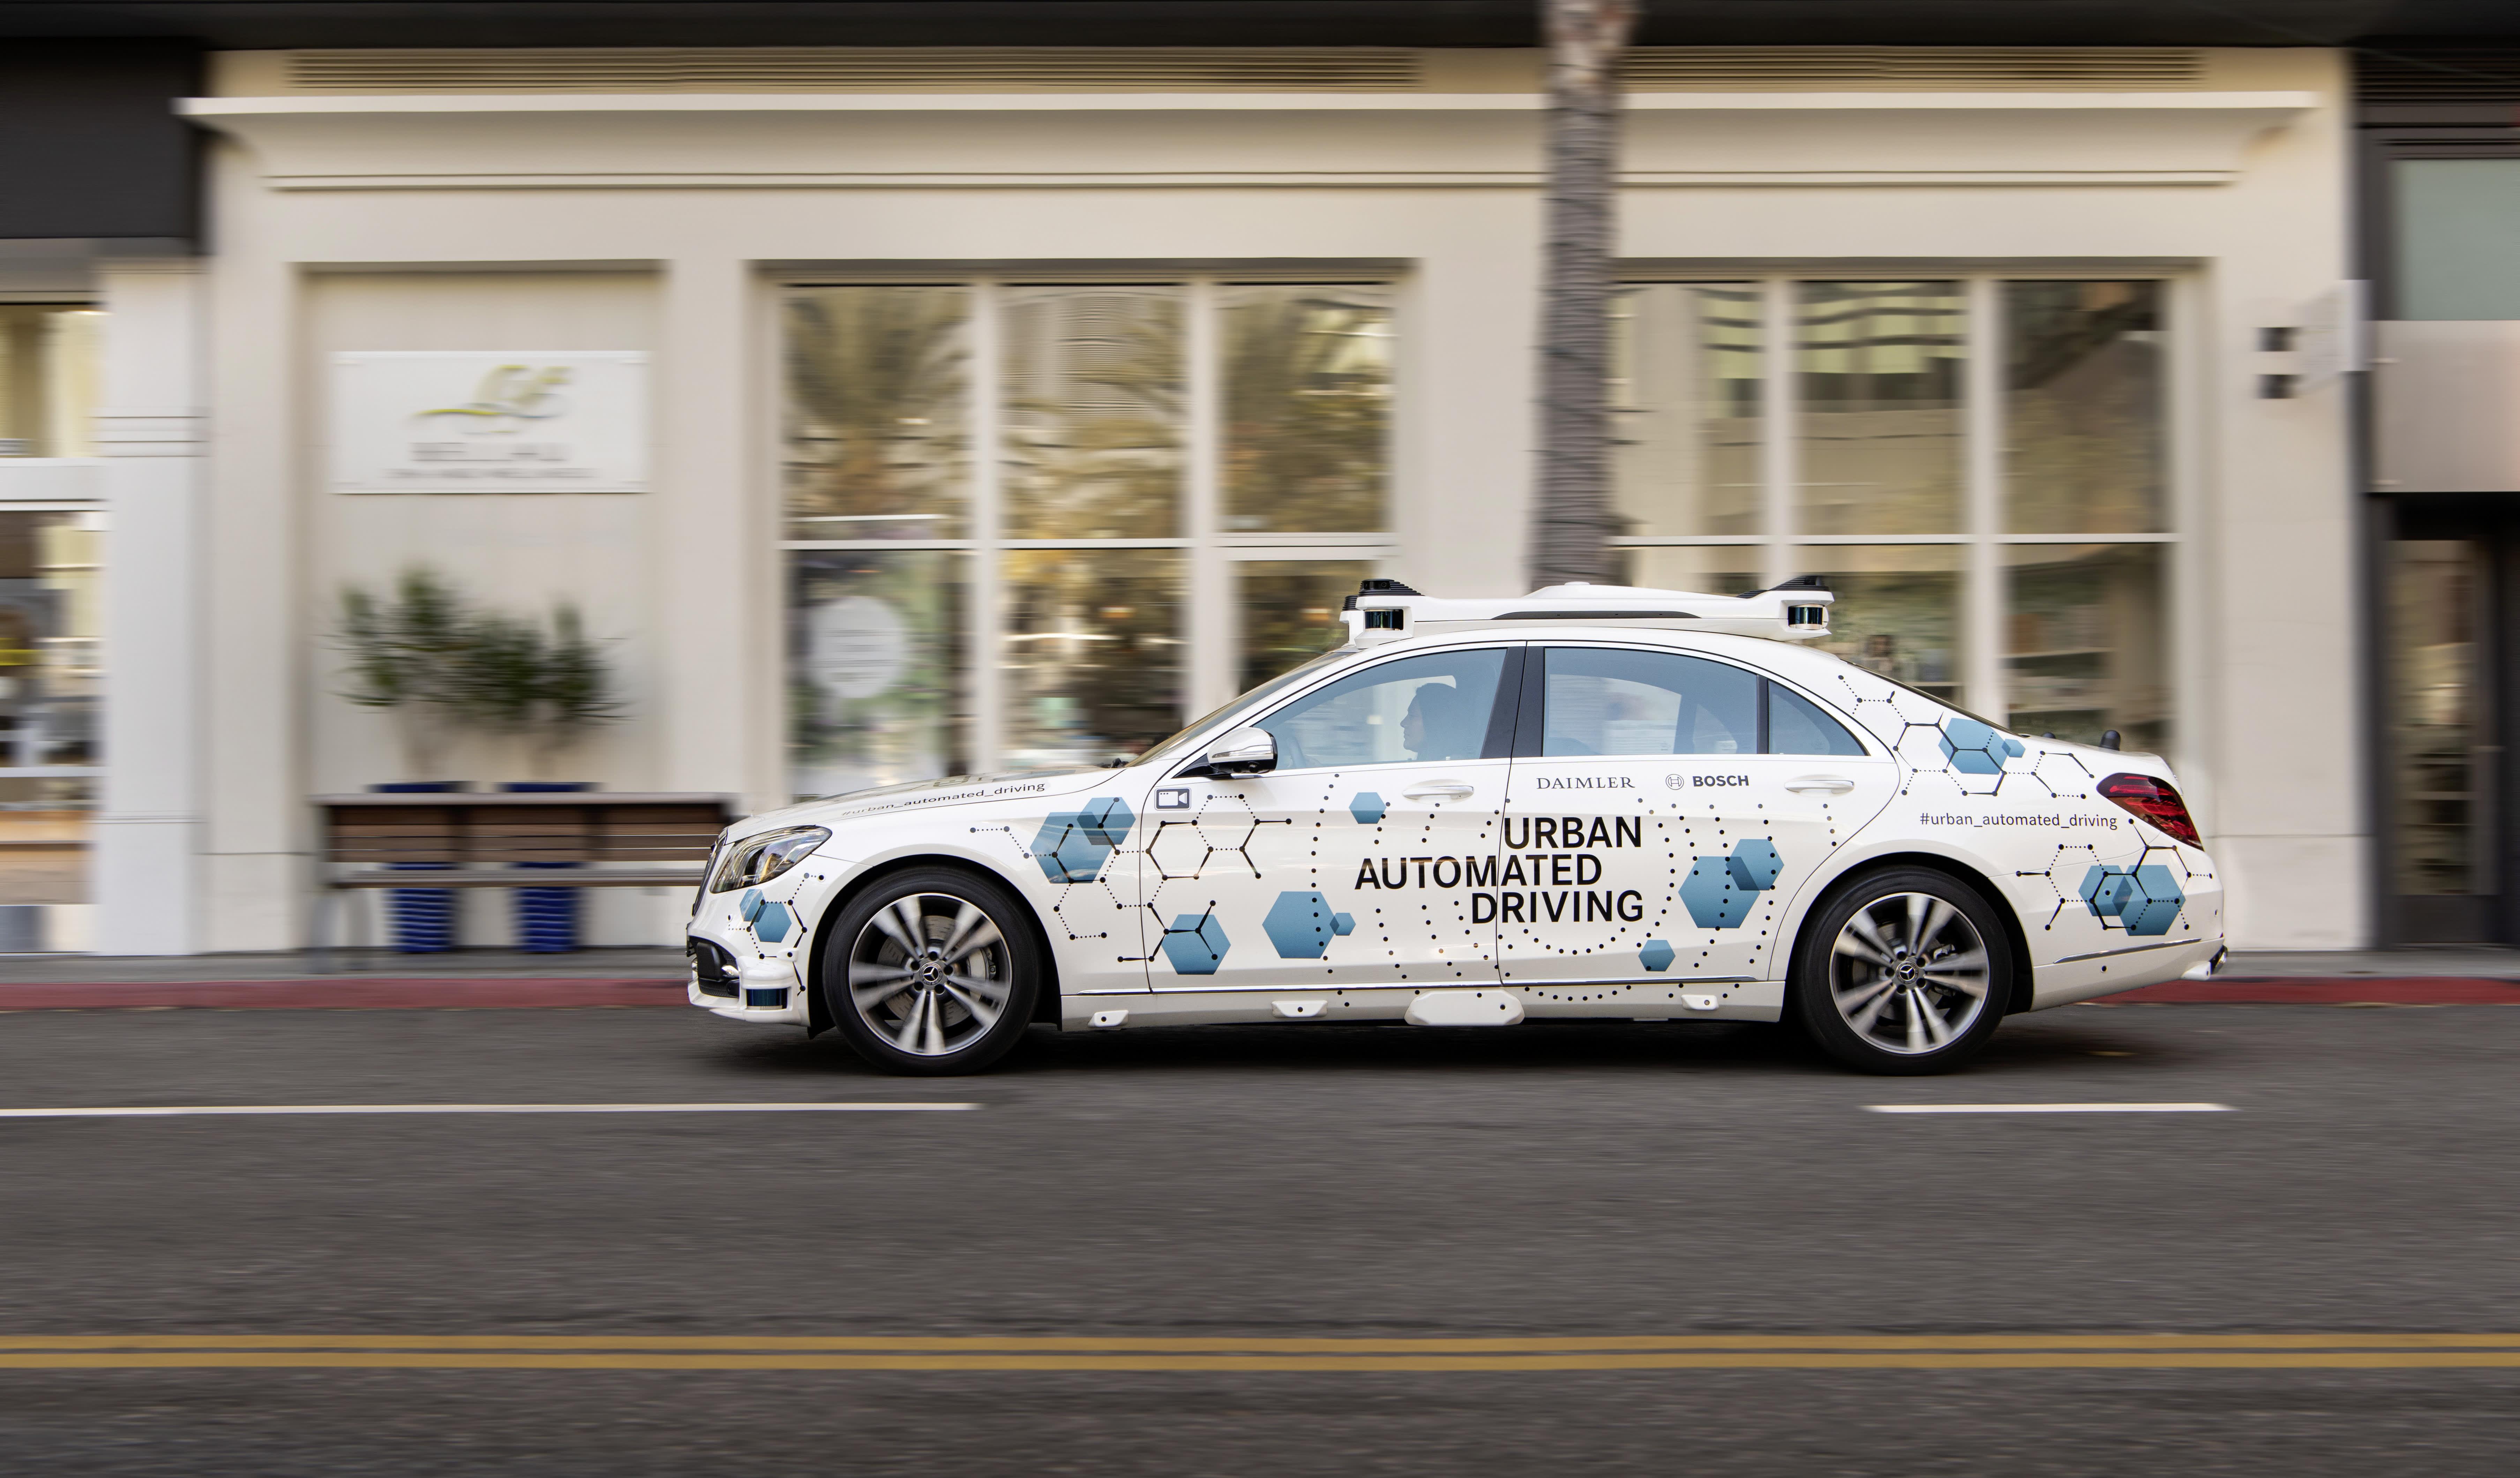 Mercedes robo-taxi service gets underway in California